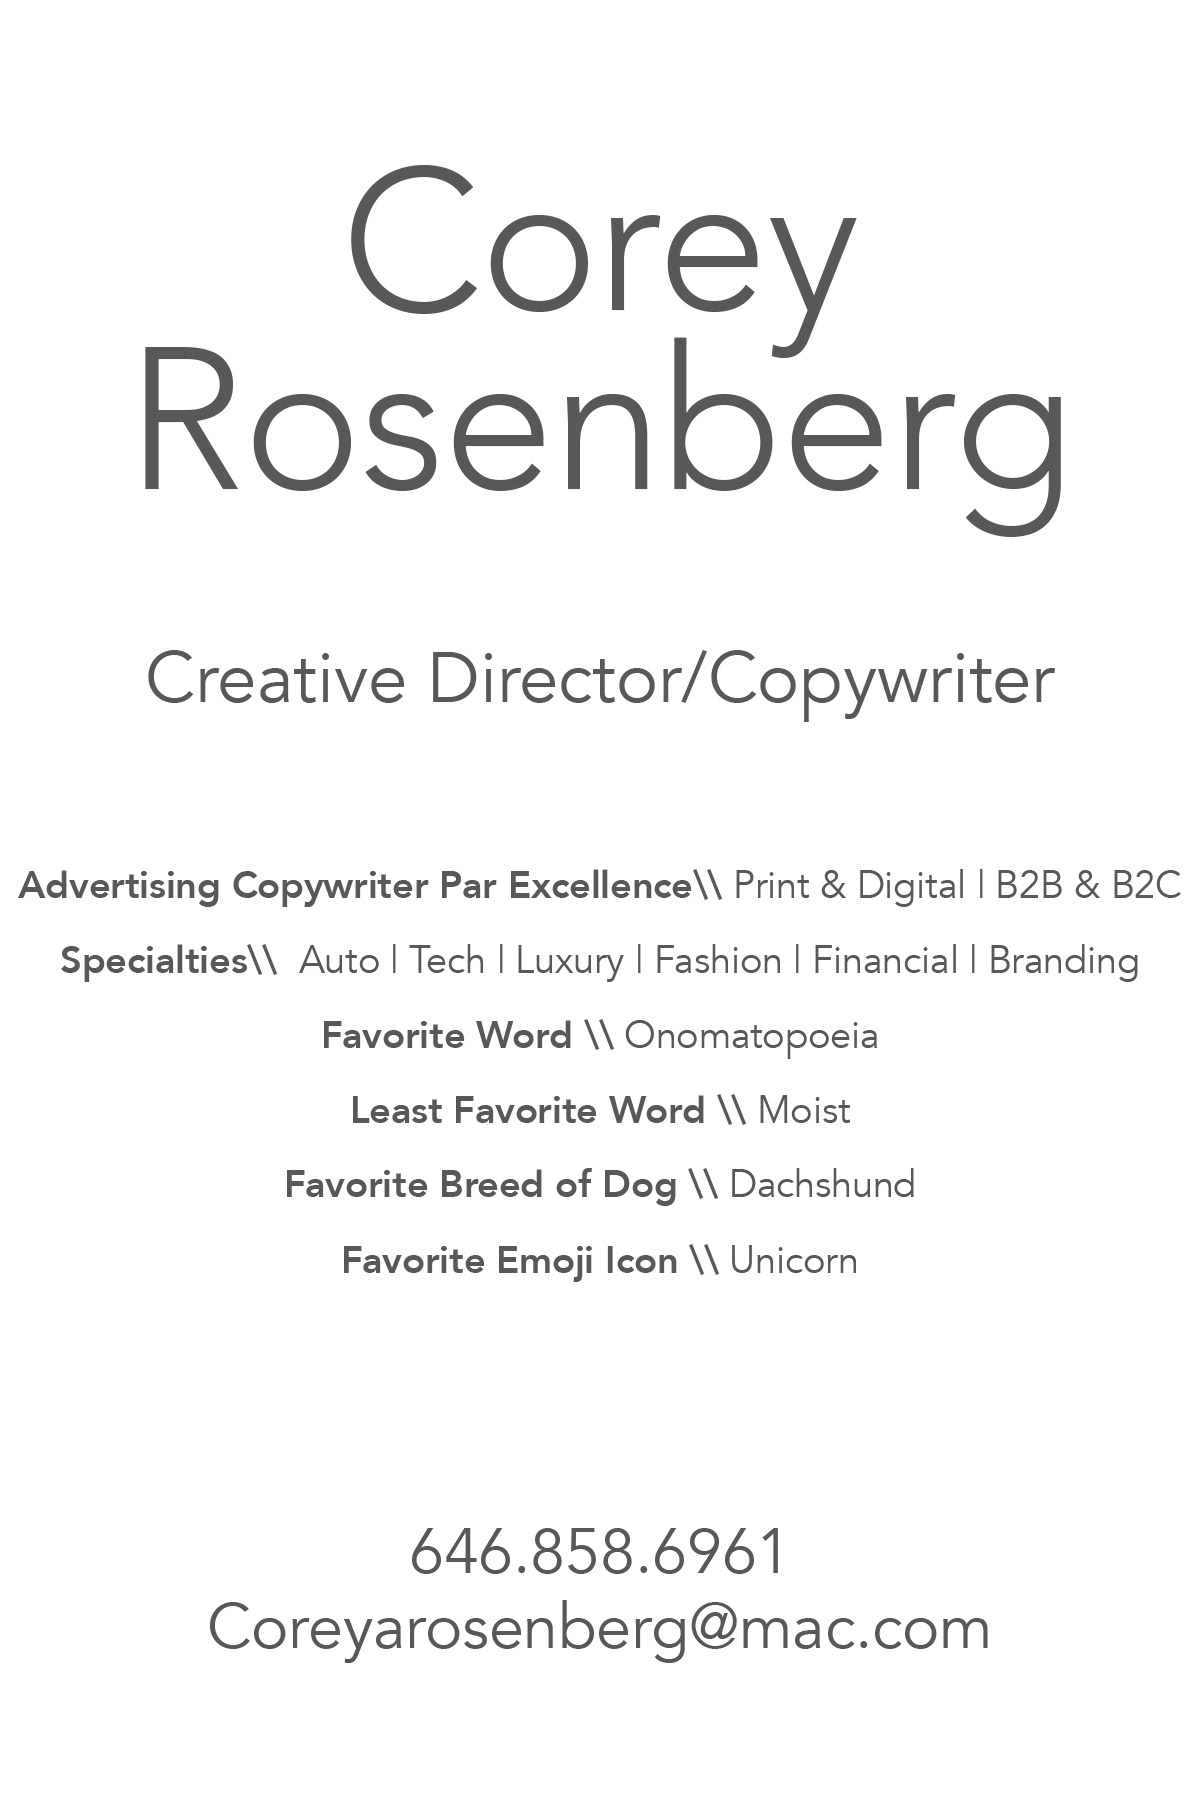 Corey Rosenberg